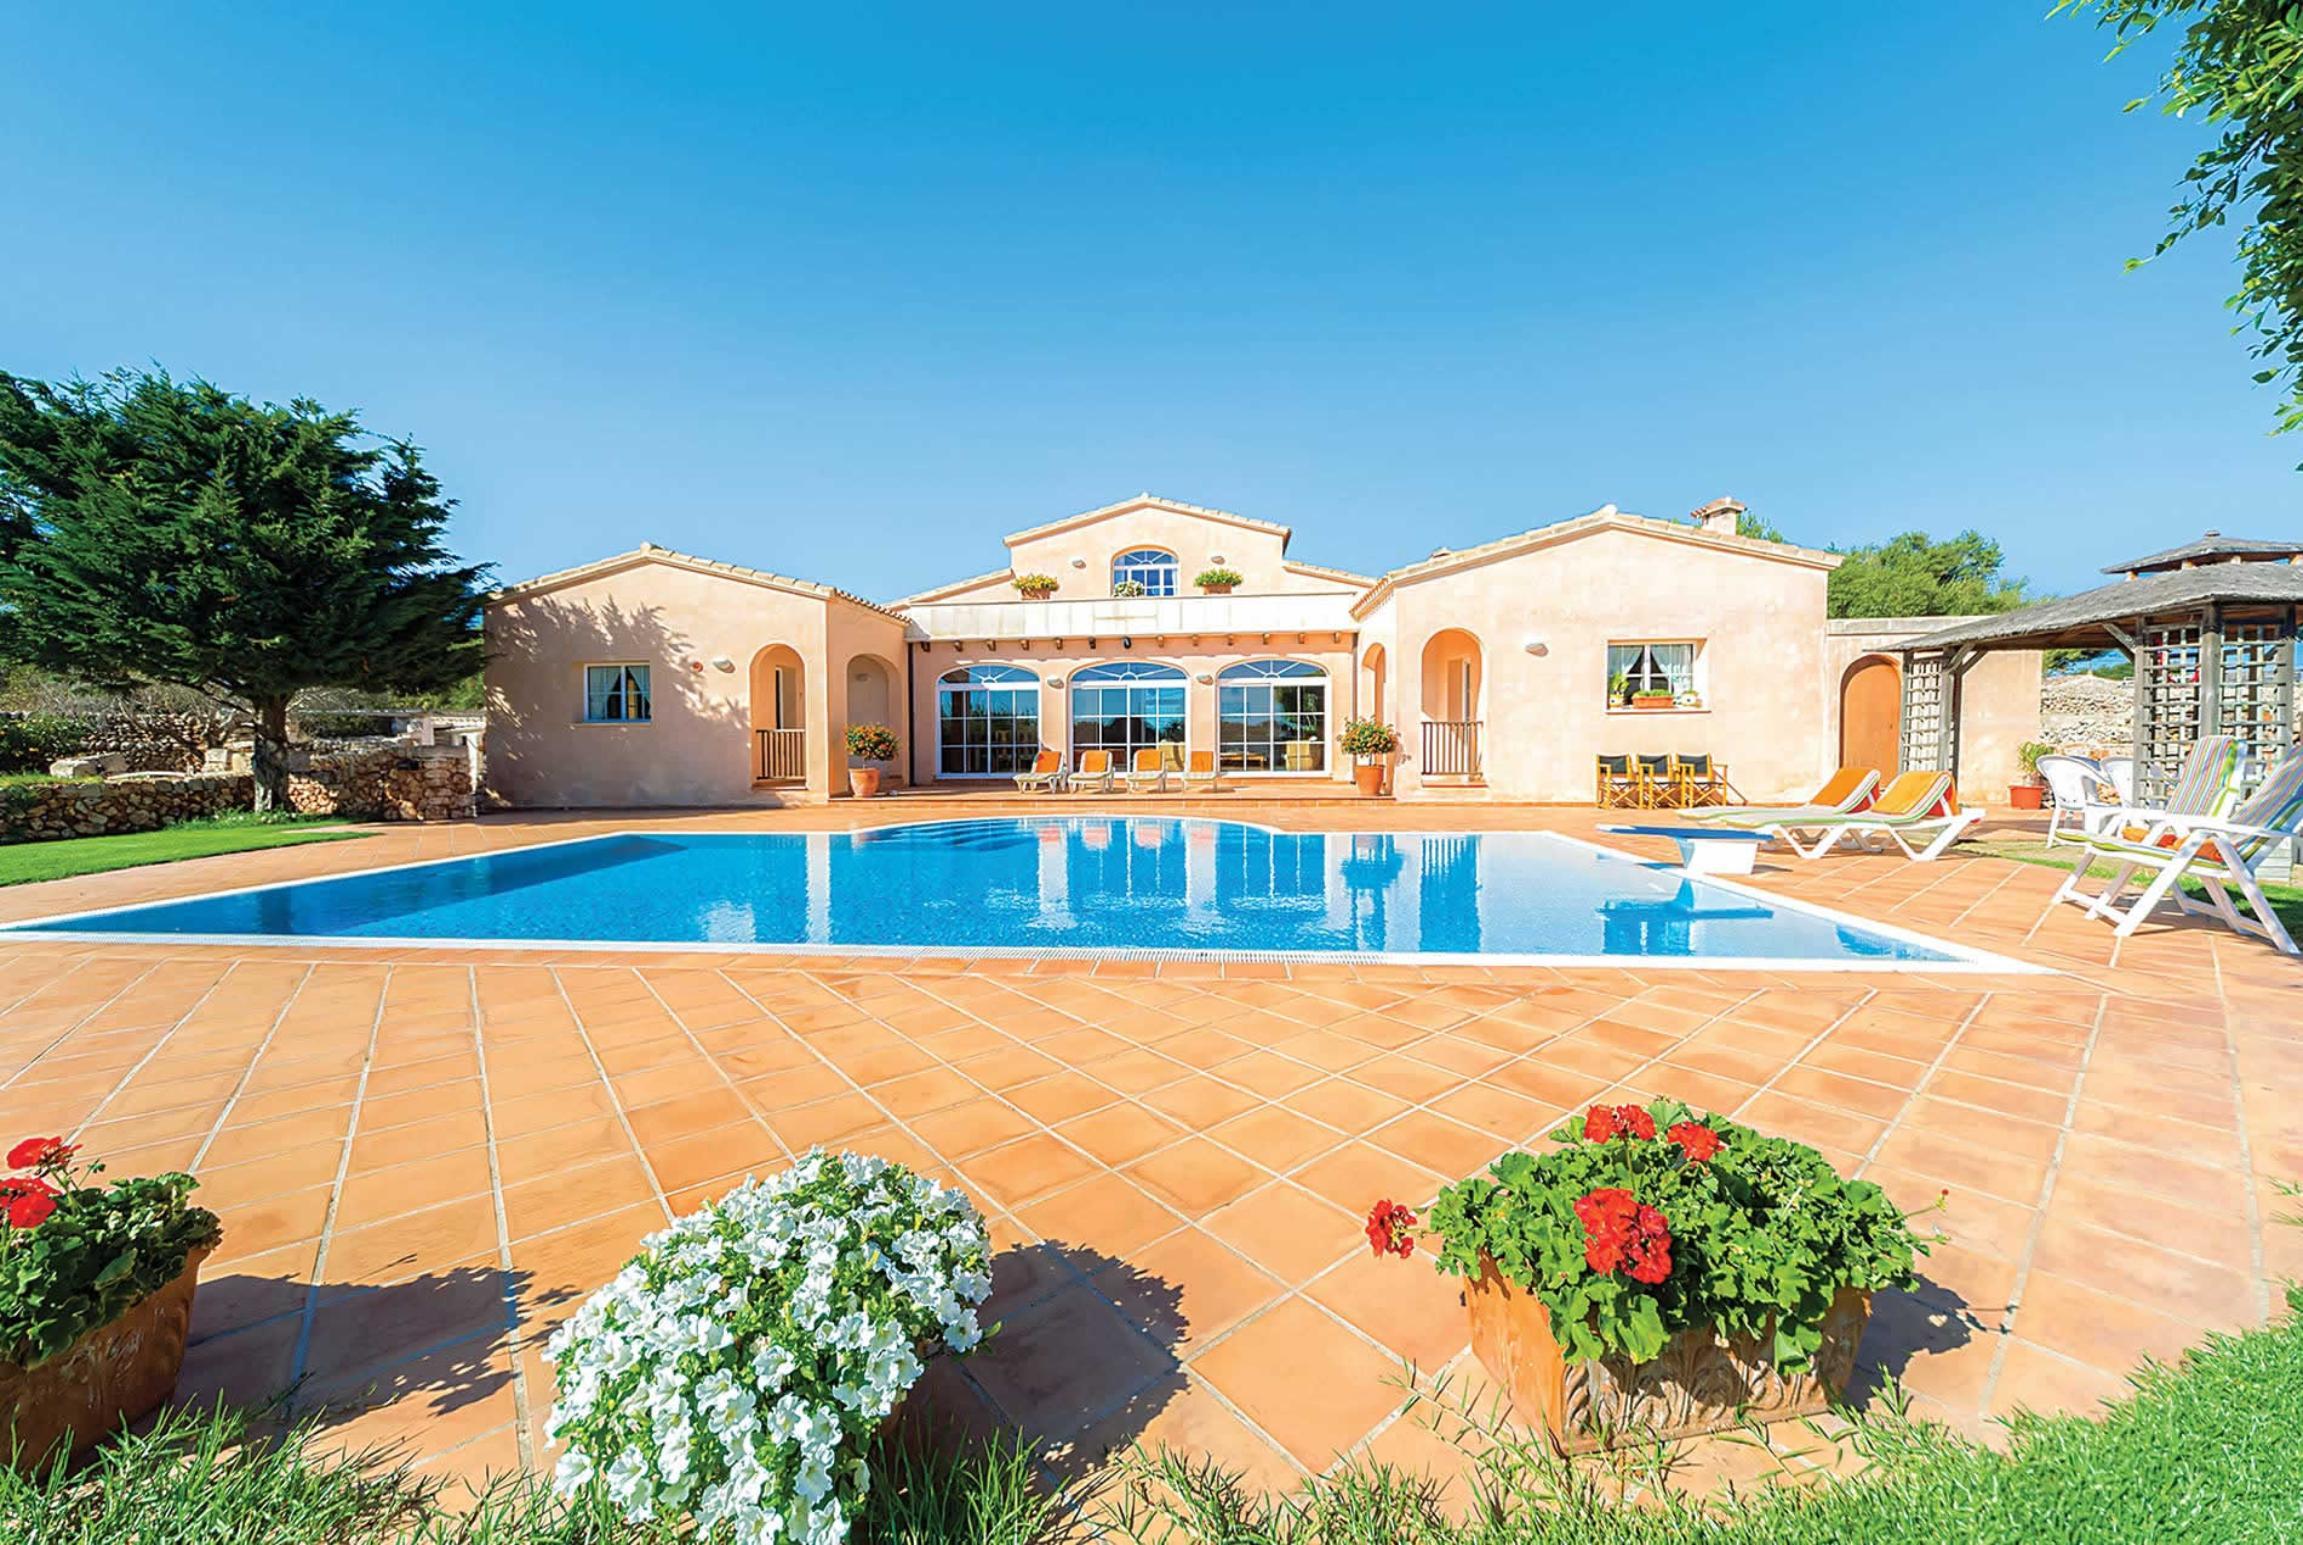 Ferienhaus Villa Estrellita (2649653), Punta Prima, Menorca, Balearische Inseln, Spanien, Bild 1